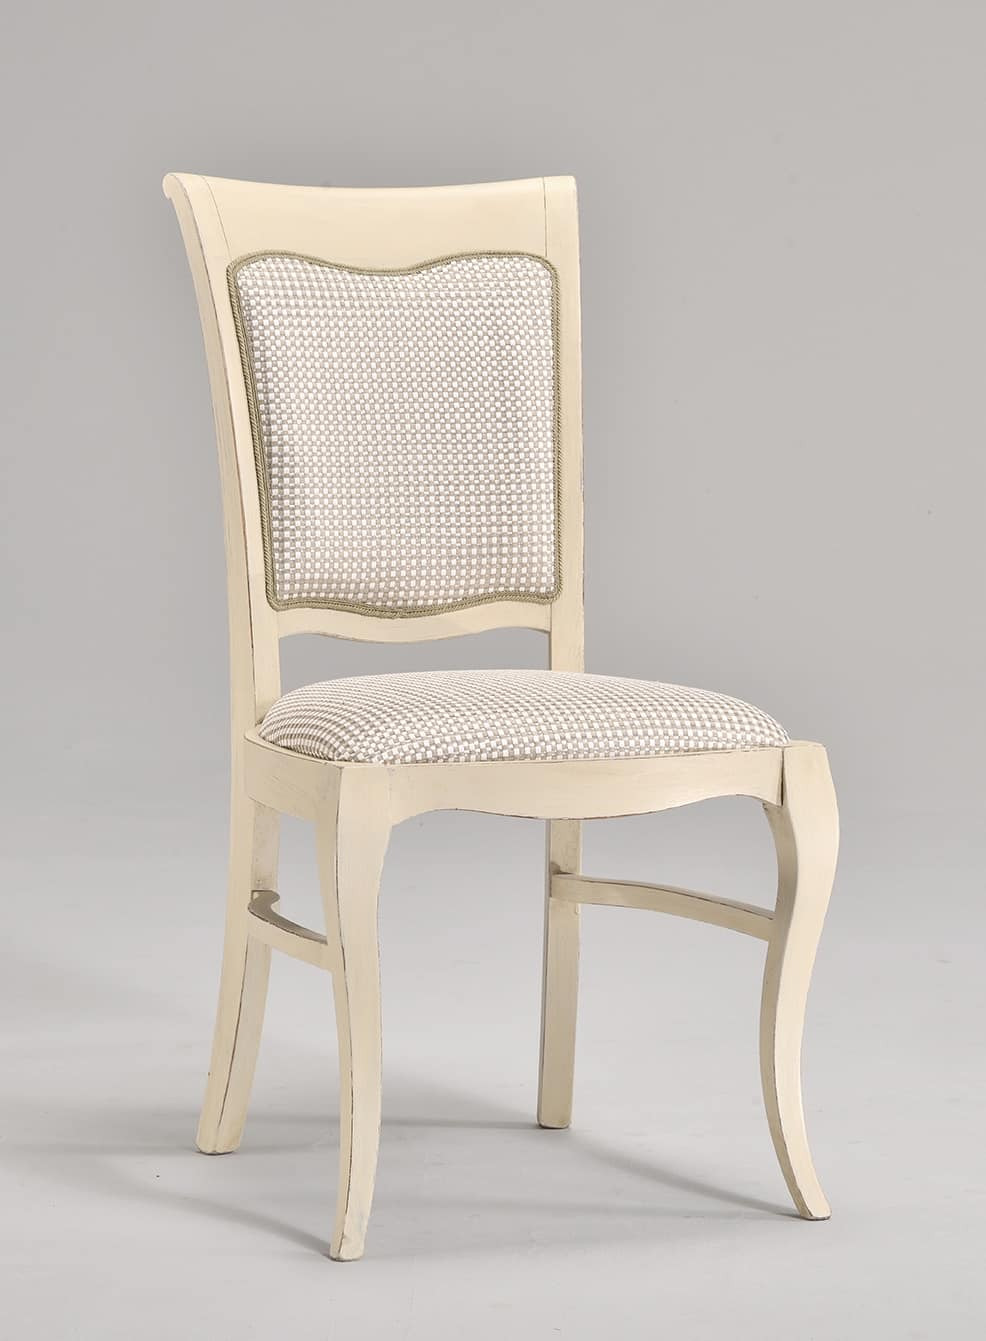 Sedia per soggiorni in stile classico, imbottita | IDFdesign